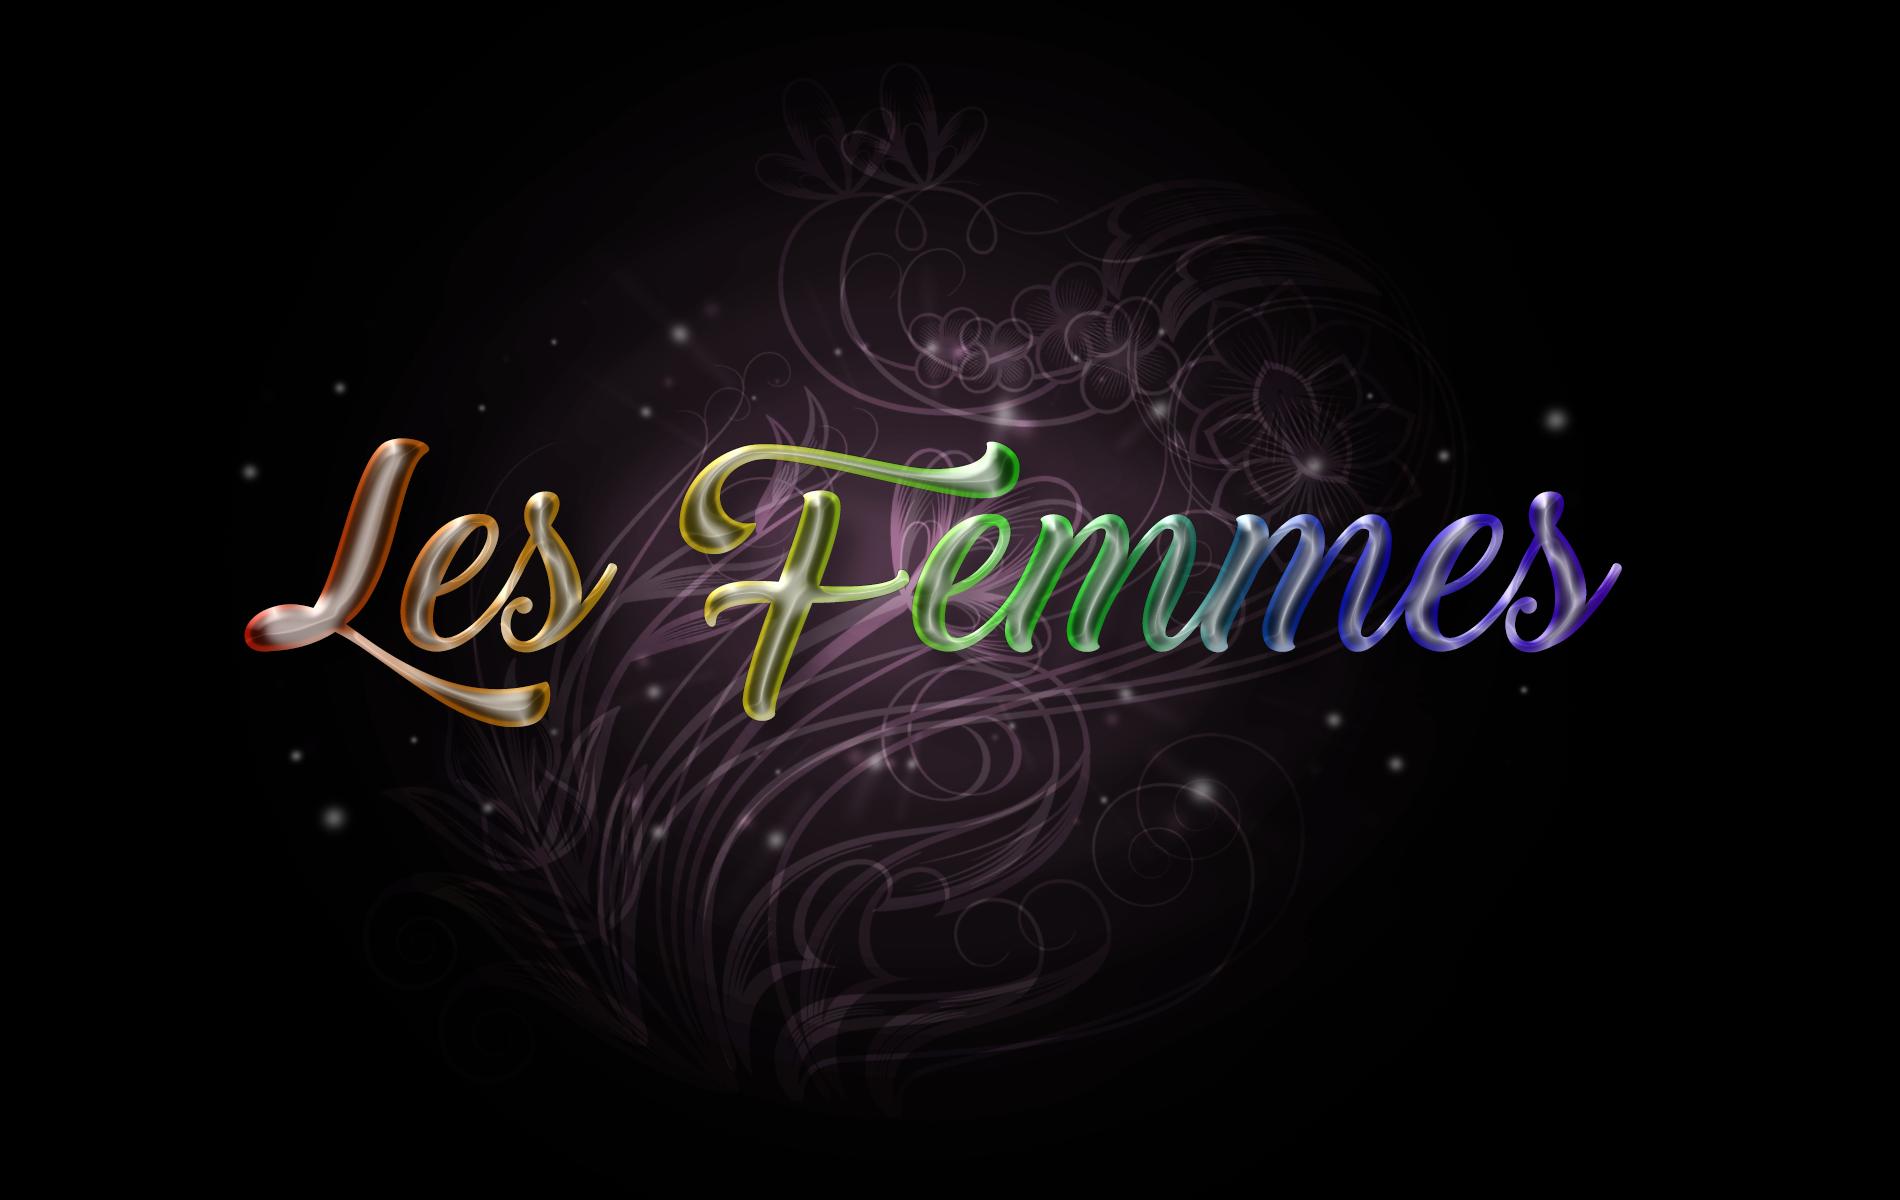 Les Femmes.png